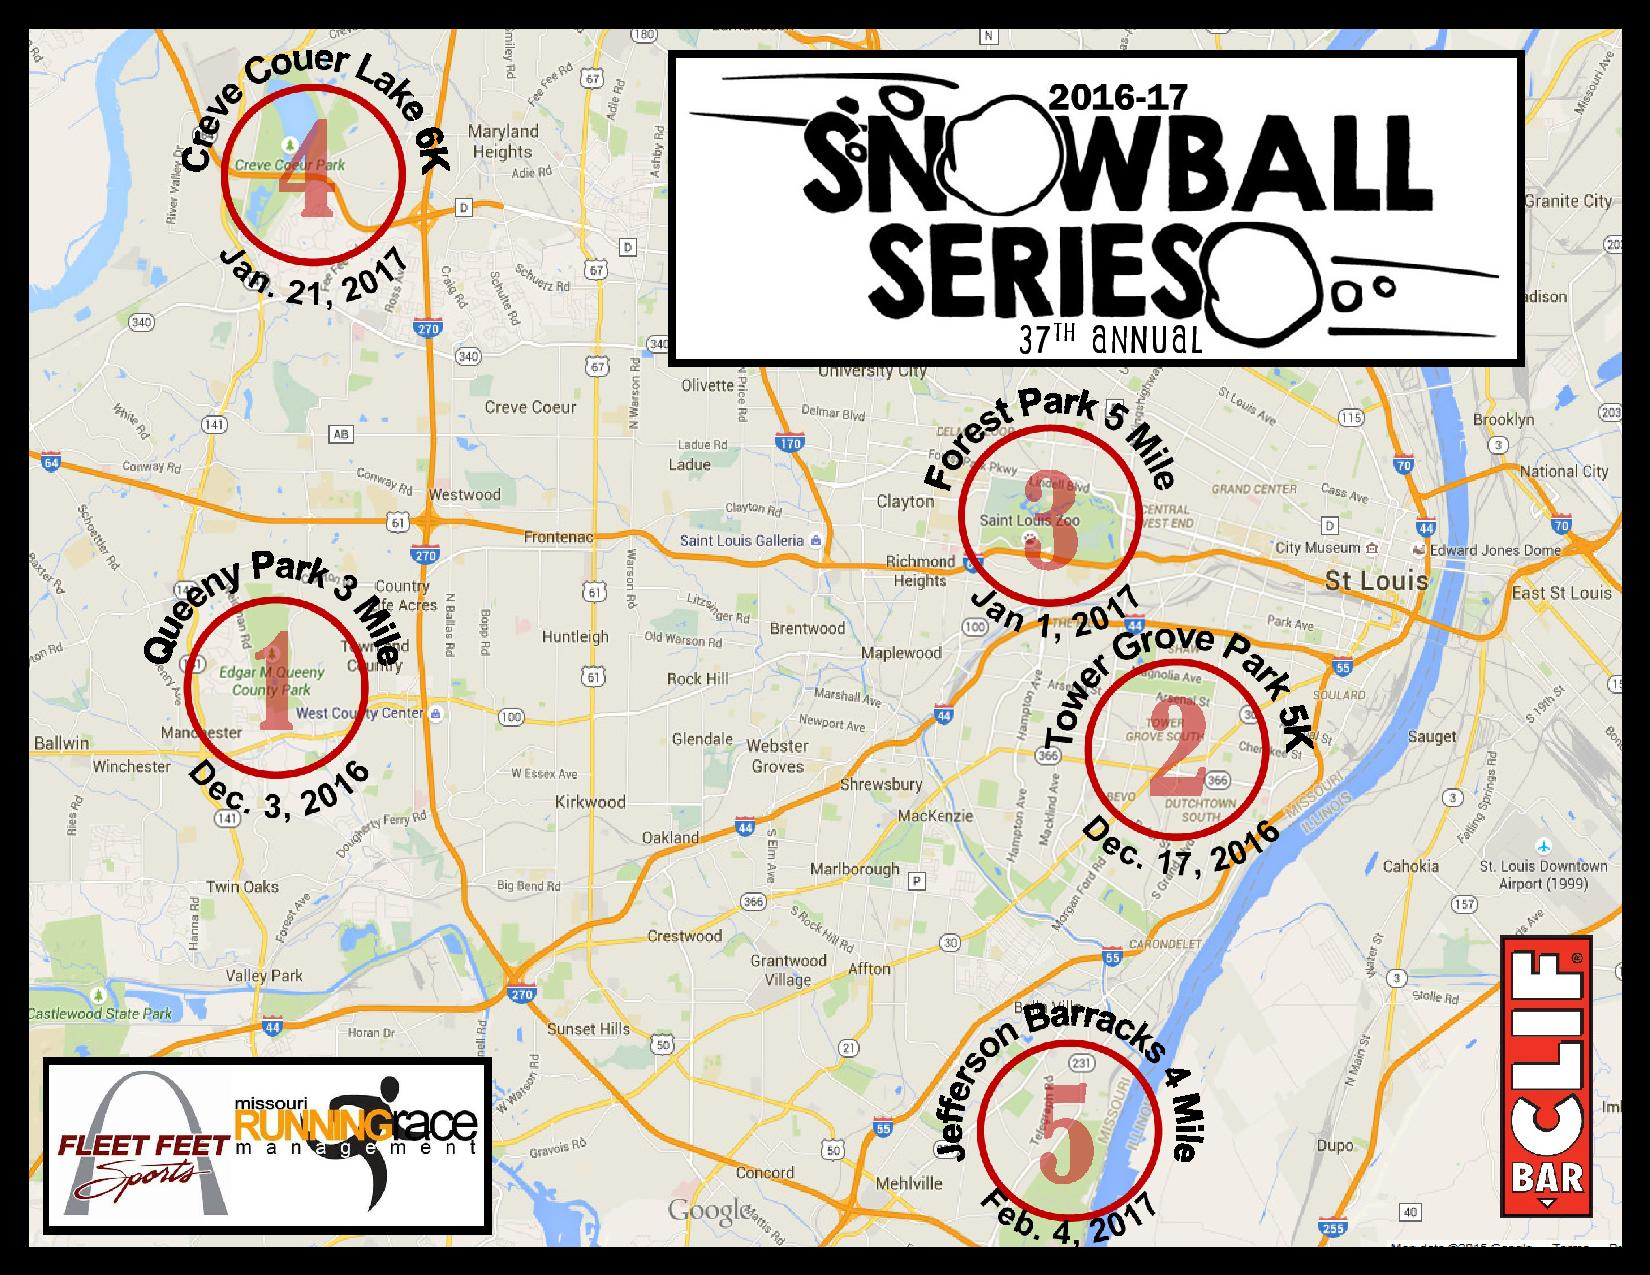 Snowball Series